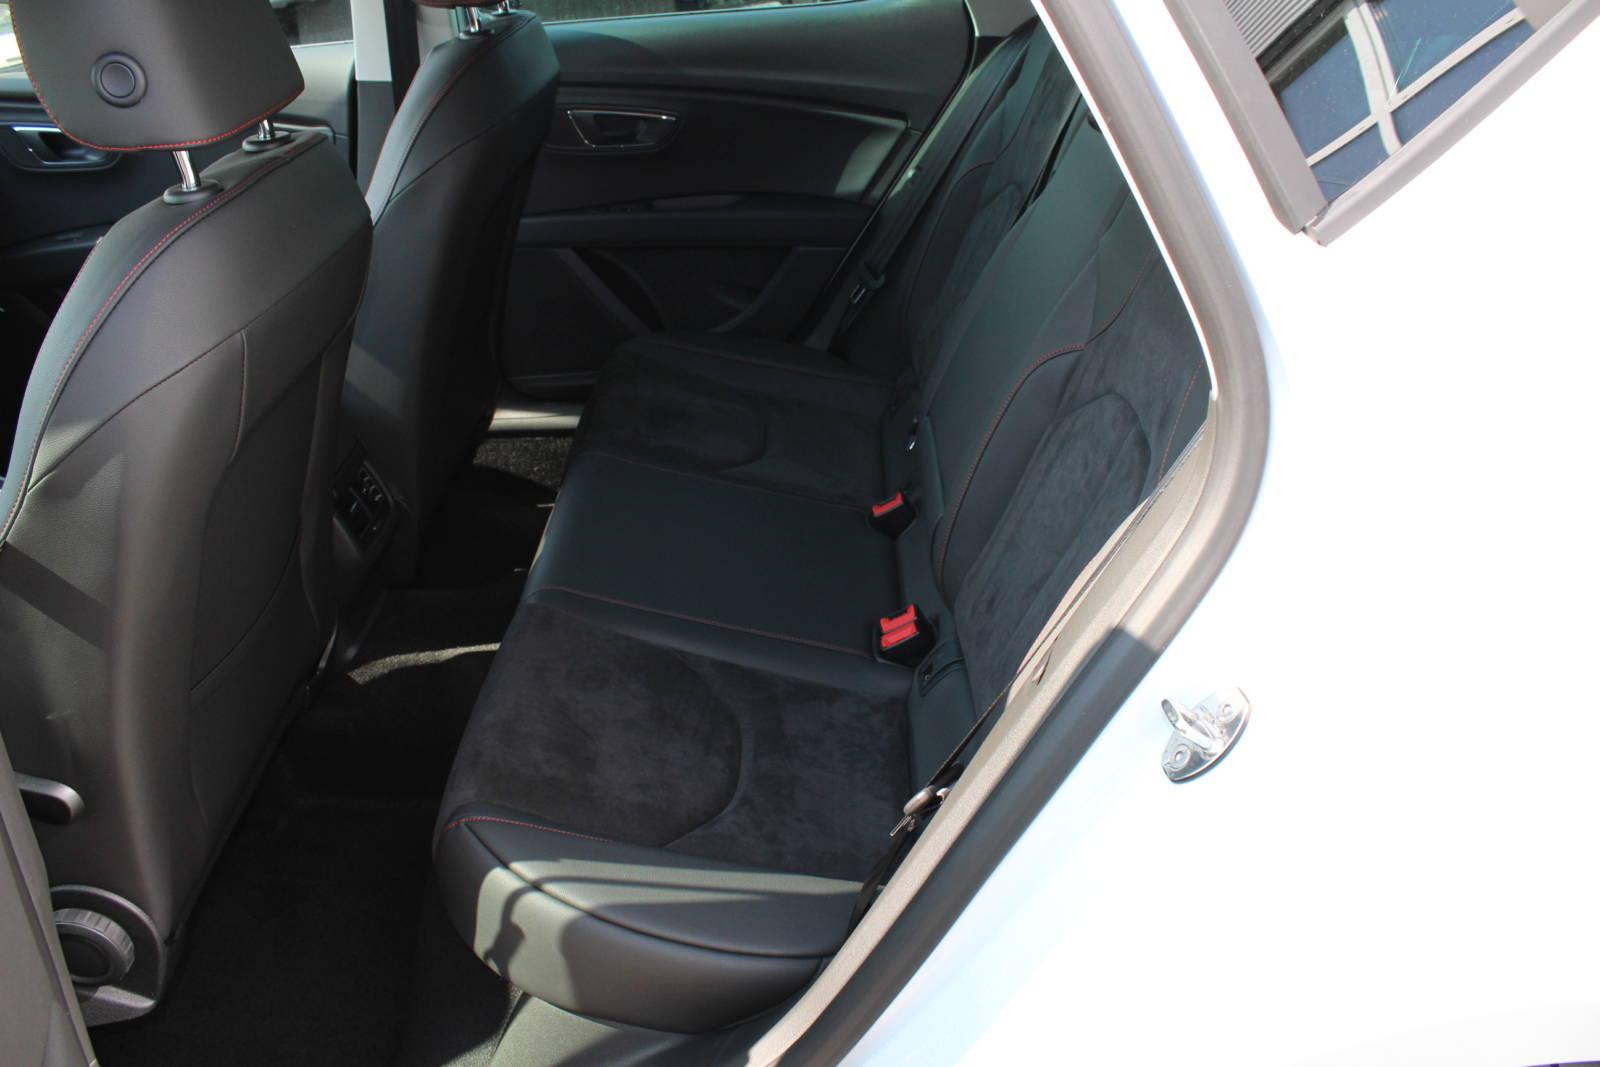 Seat Leon FR Limousine 1.8 TSI DSG / Deutsche Neufahrzeuge und EU-Neufahrzeuge – Aha! Fahrzeughandel GmbH in Althengstett